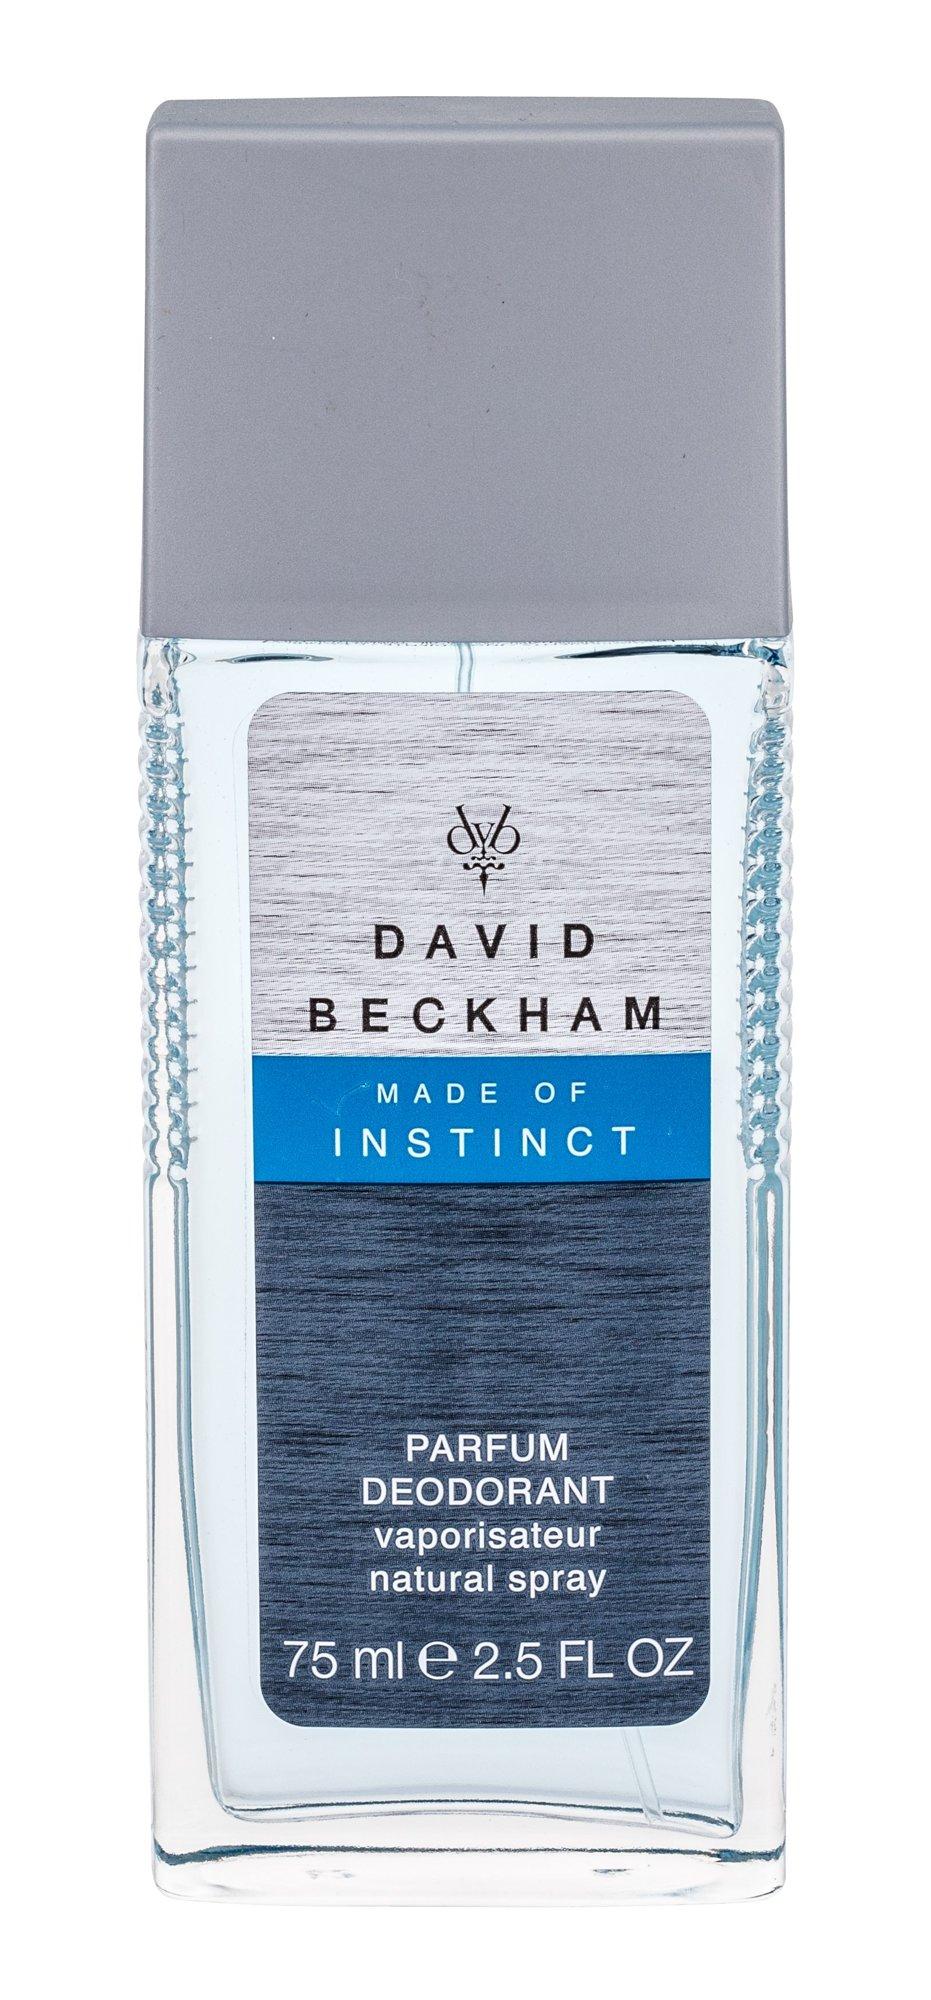 David Beckham Made of Instinct Deodorant 75ml